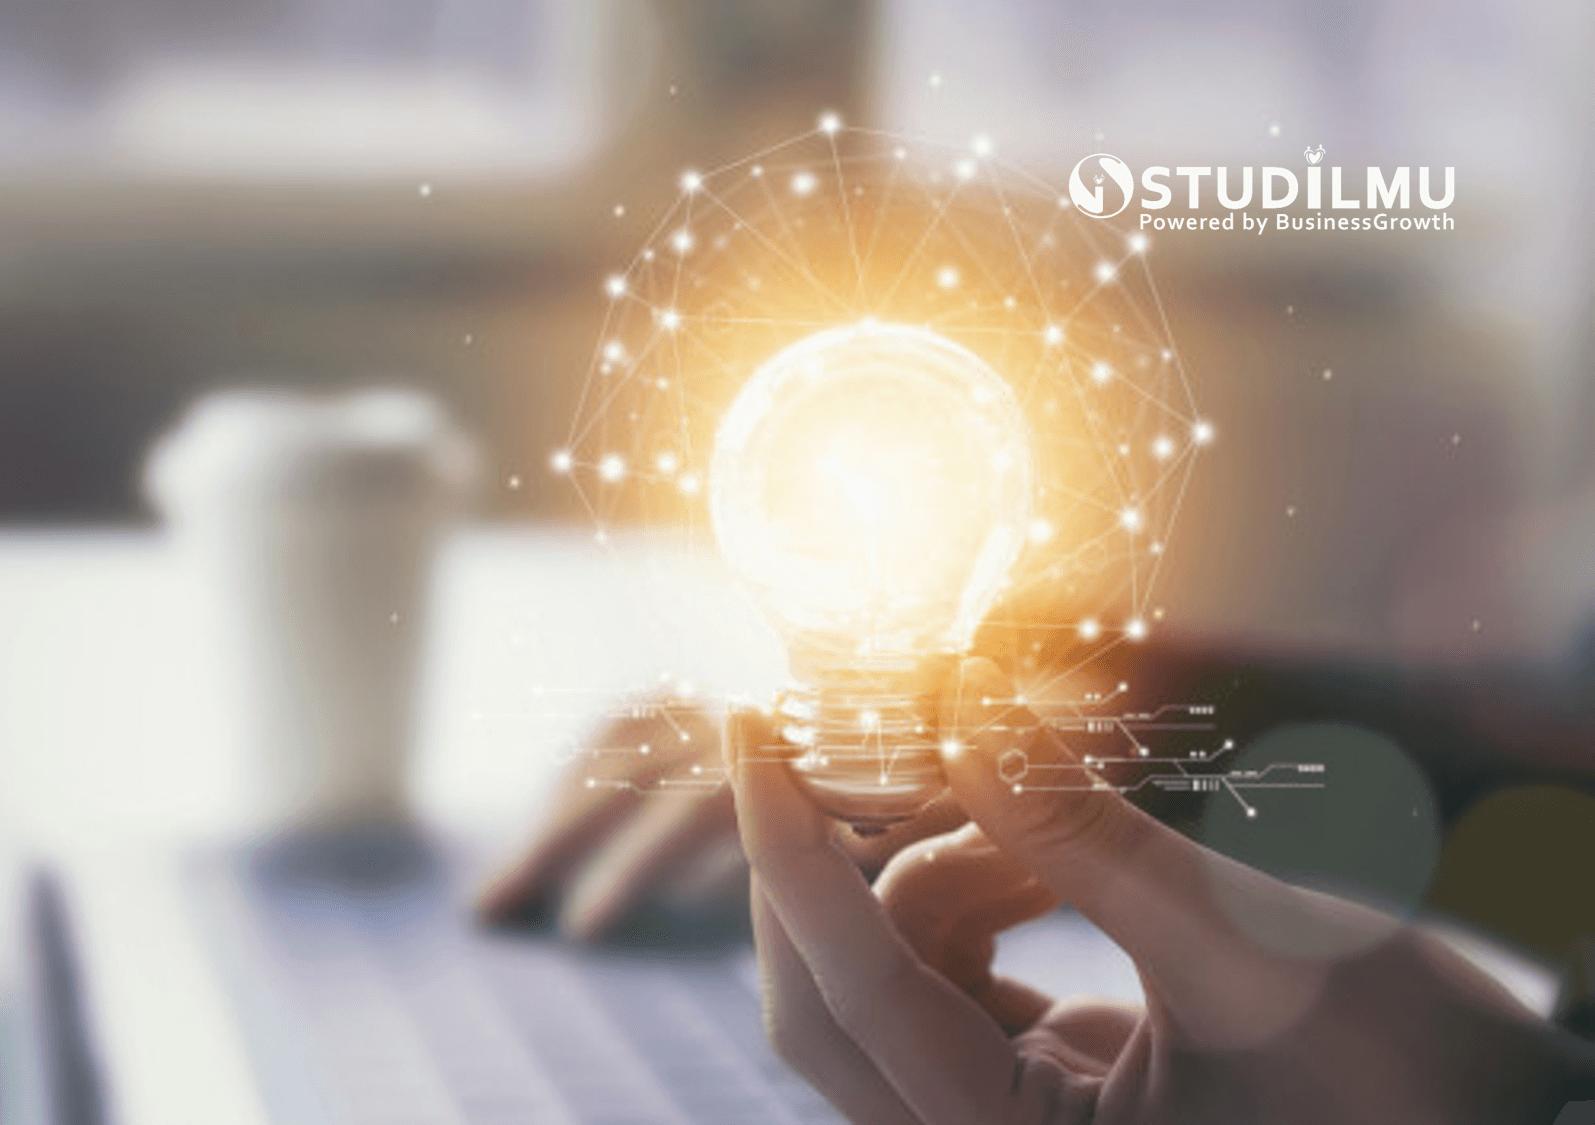 STUDILMU Career Advice - 5 Pertanyaan Meningkatkan Semangat Inovasi